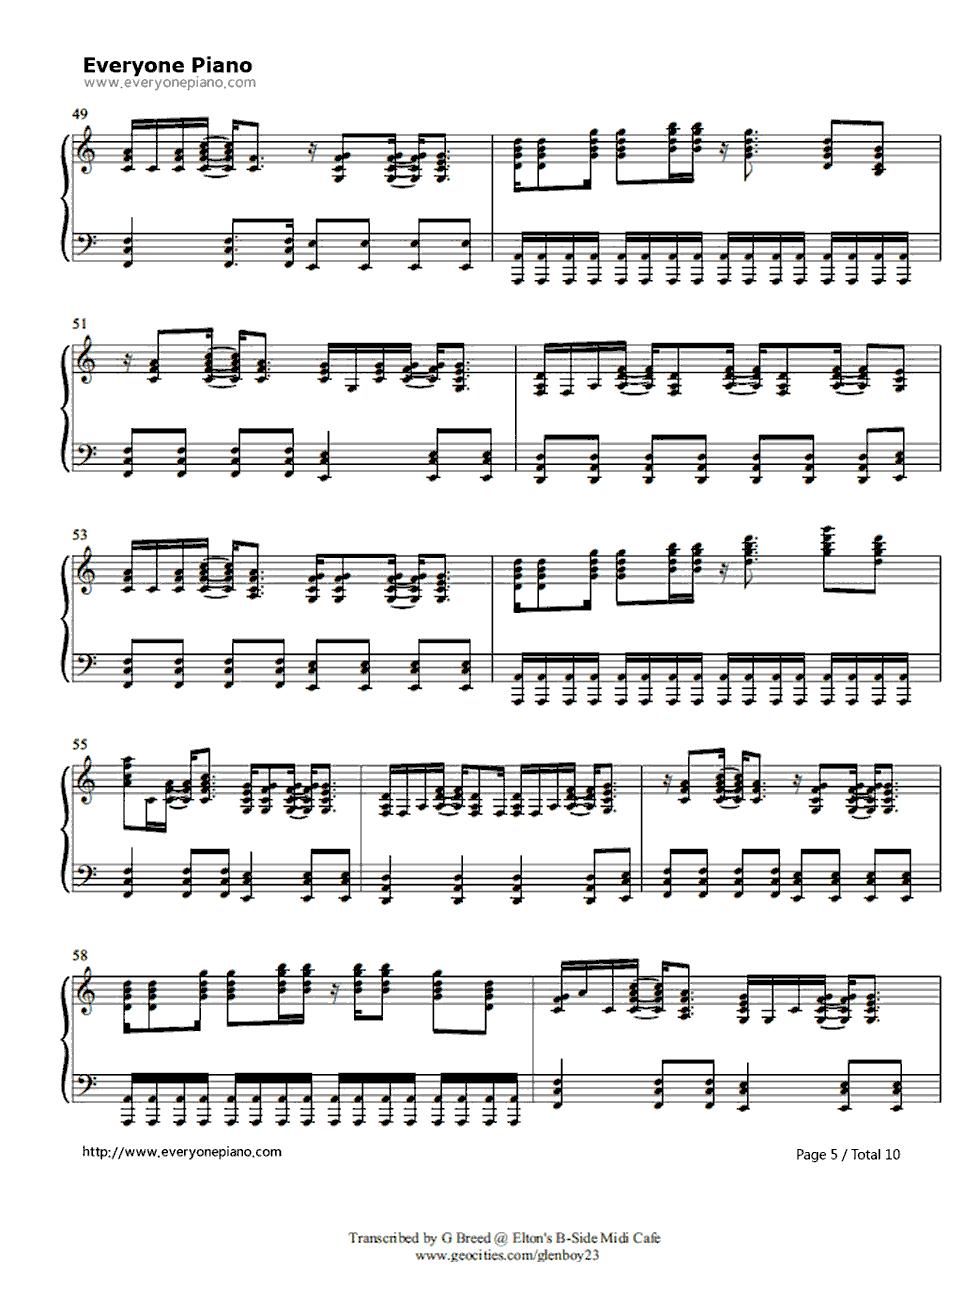 Tiny dancer elton john stave preview 5 free piano sheet music listen now print sheet tiny dancer elton john stave preview 5 hexwebz Images